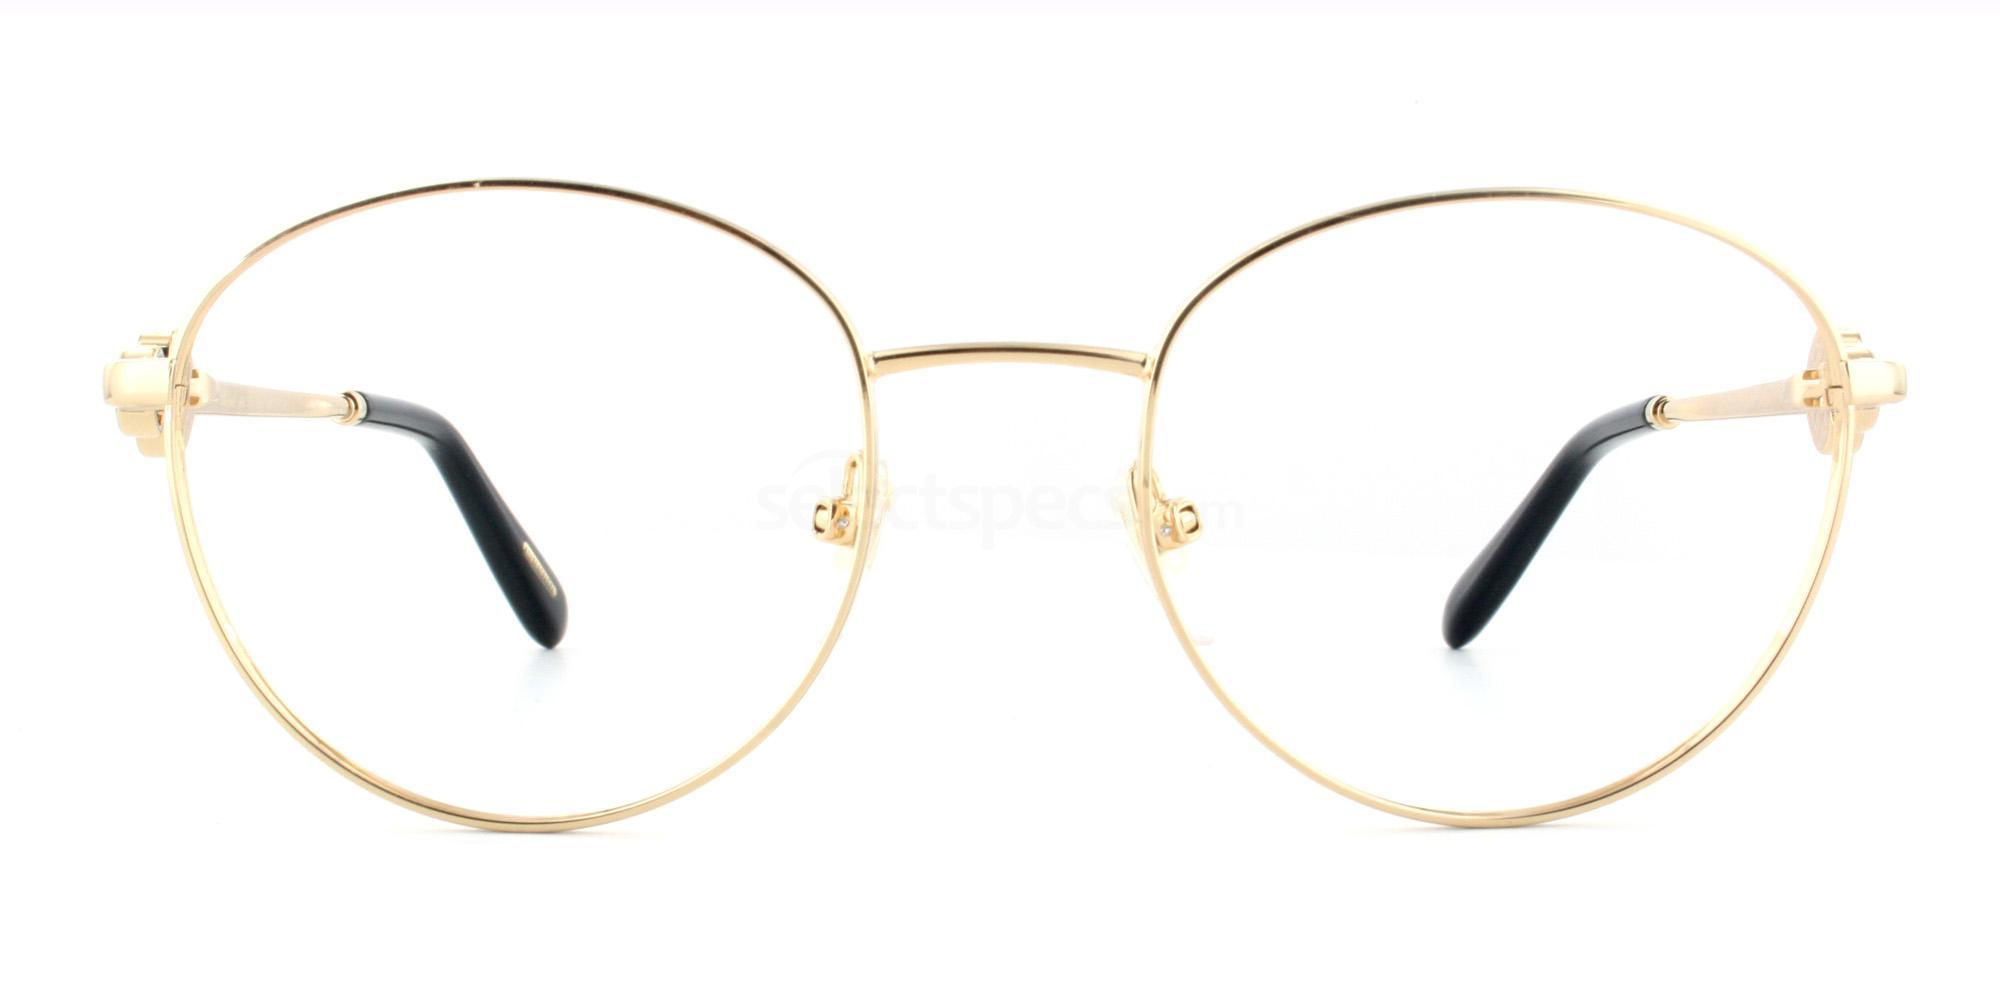 0300 VCHC52S Glasses, Chopard